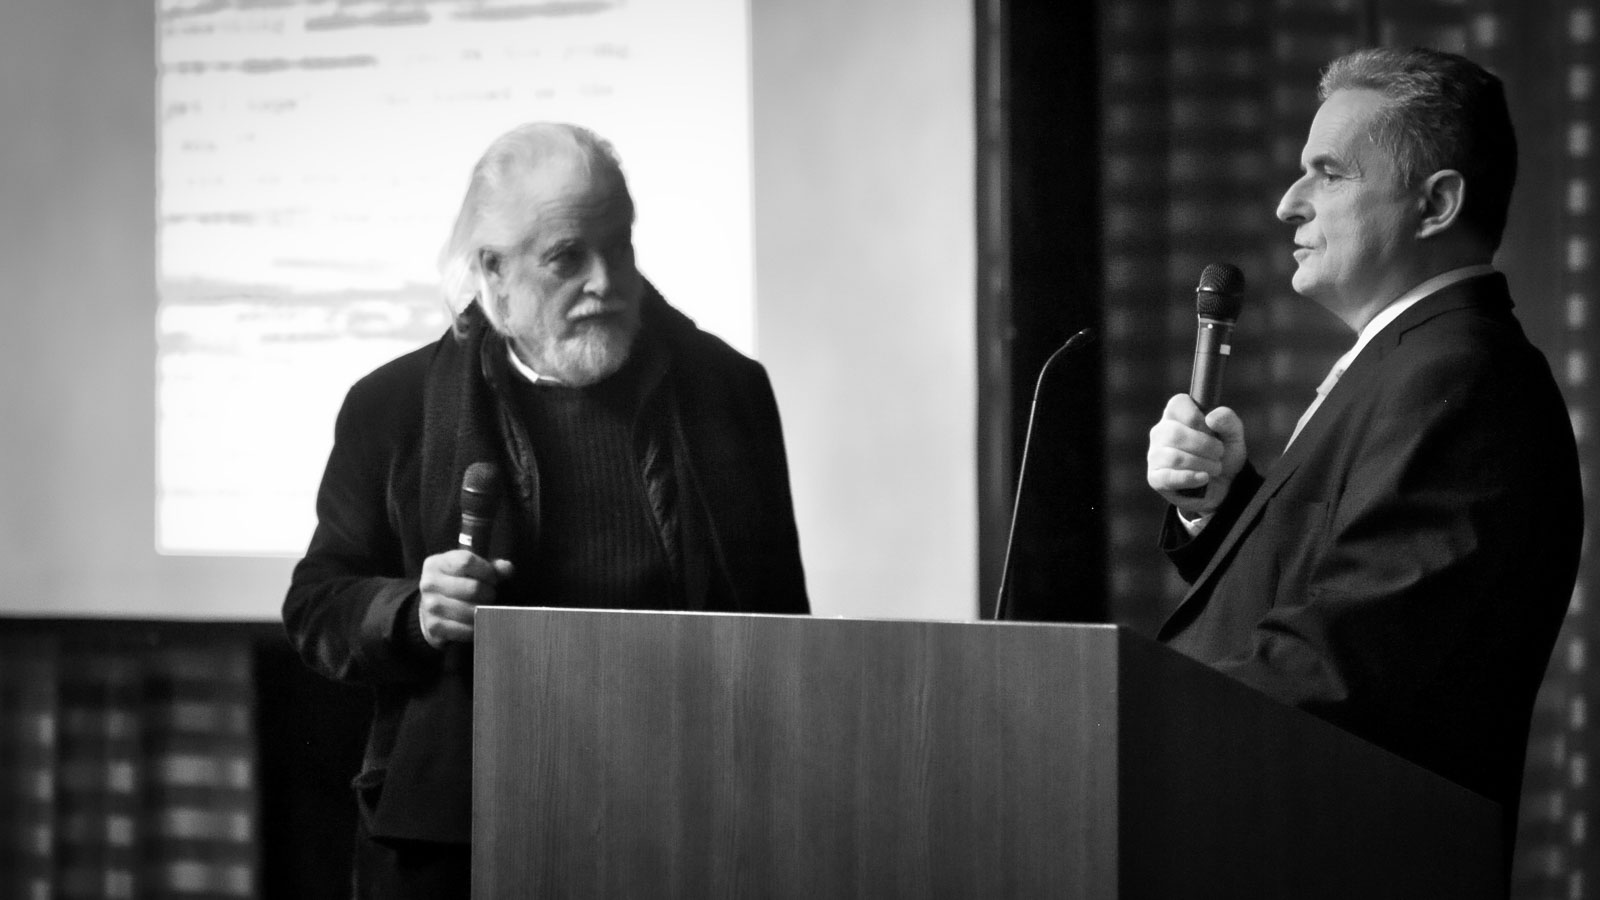 Michael Chaplin & Pierre Smolik on the podium